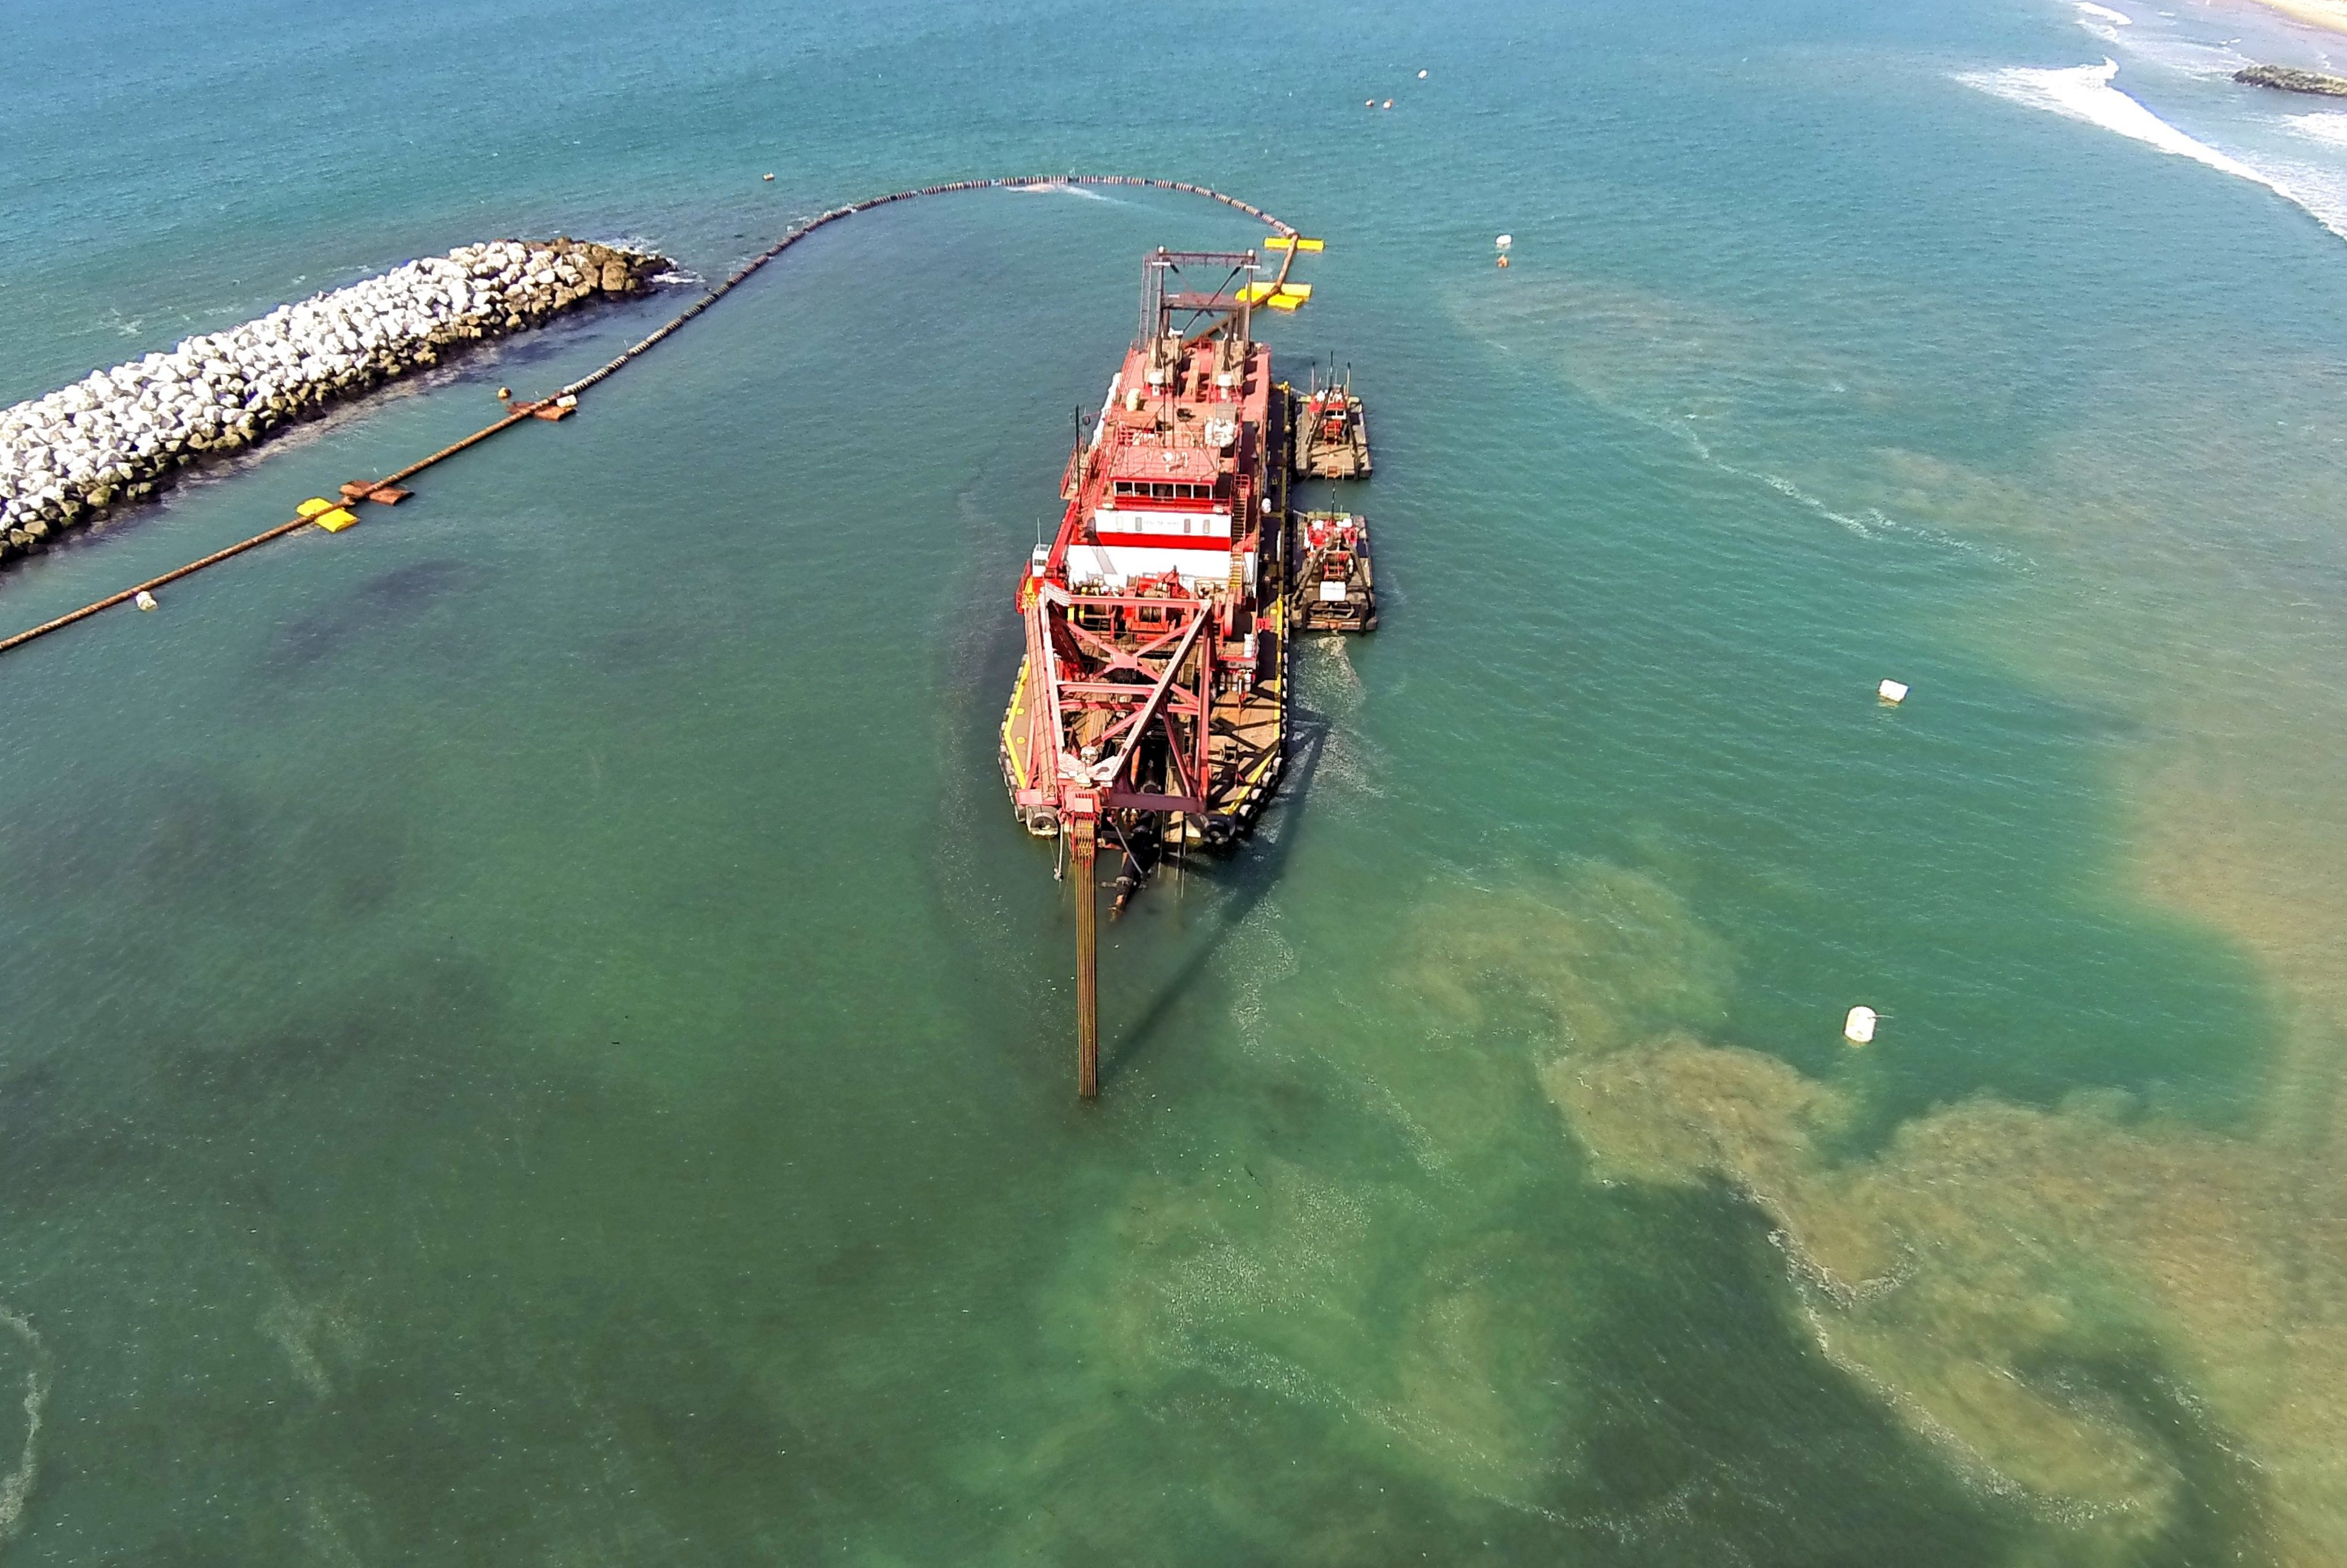 Ventura Harbor Dredging Included in Federal Budget